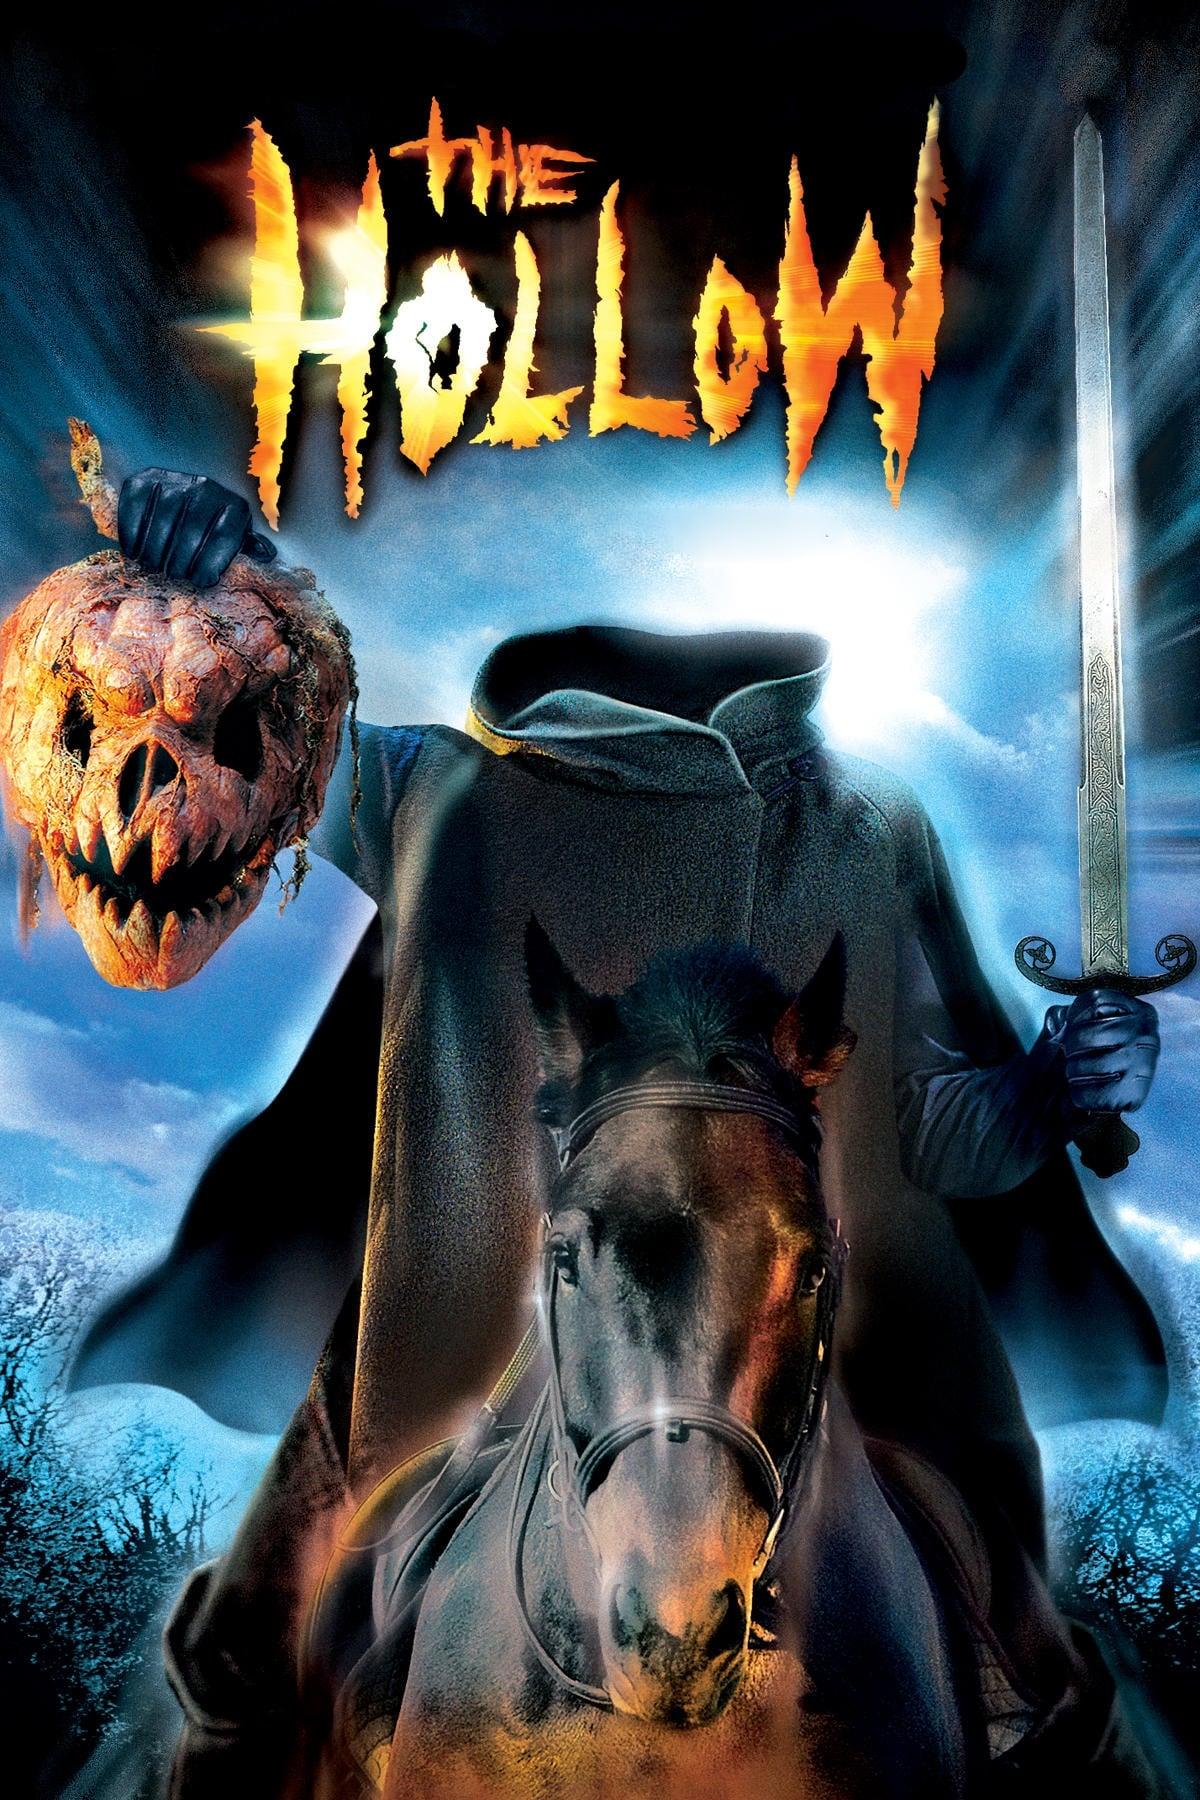 film the hollow 2004 en streaming vf complet filmstreaming hd com. Black Bedroom Furniture Sets. Home Design Ideas